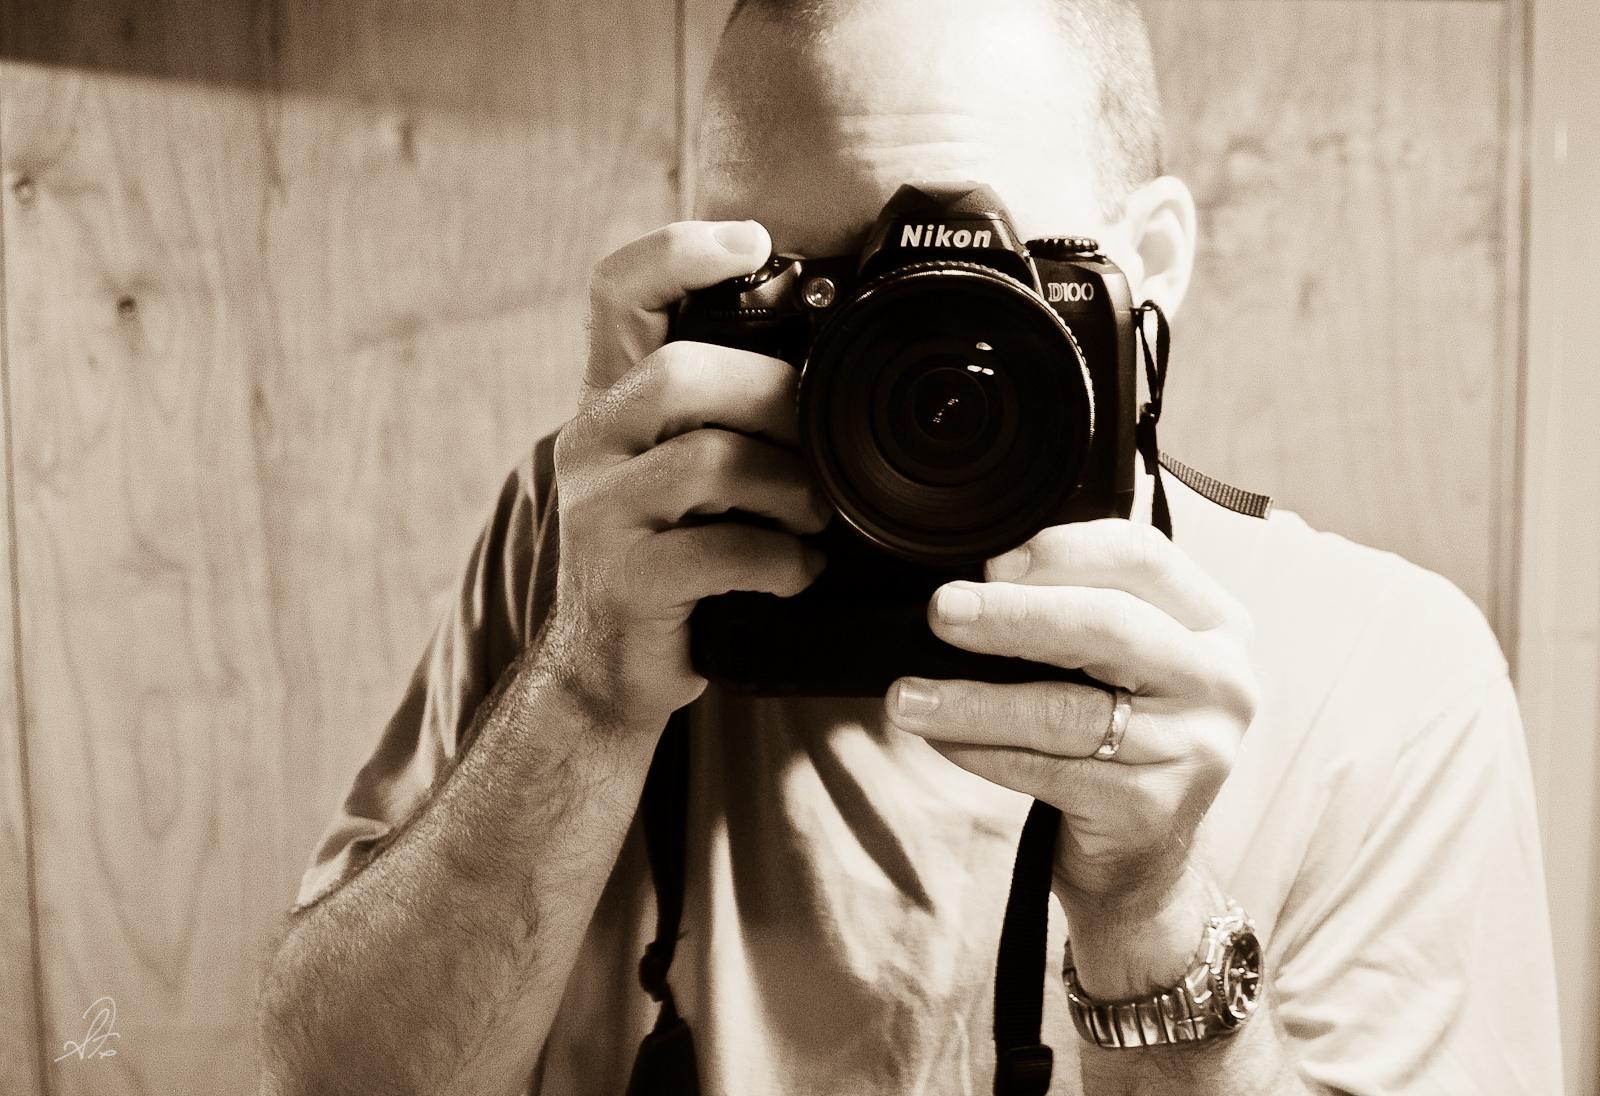 Self Portrait of My First Nikon D100 DSLR Camera